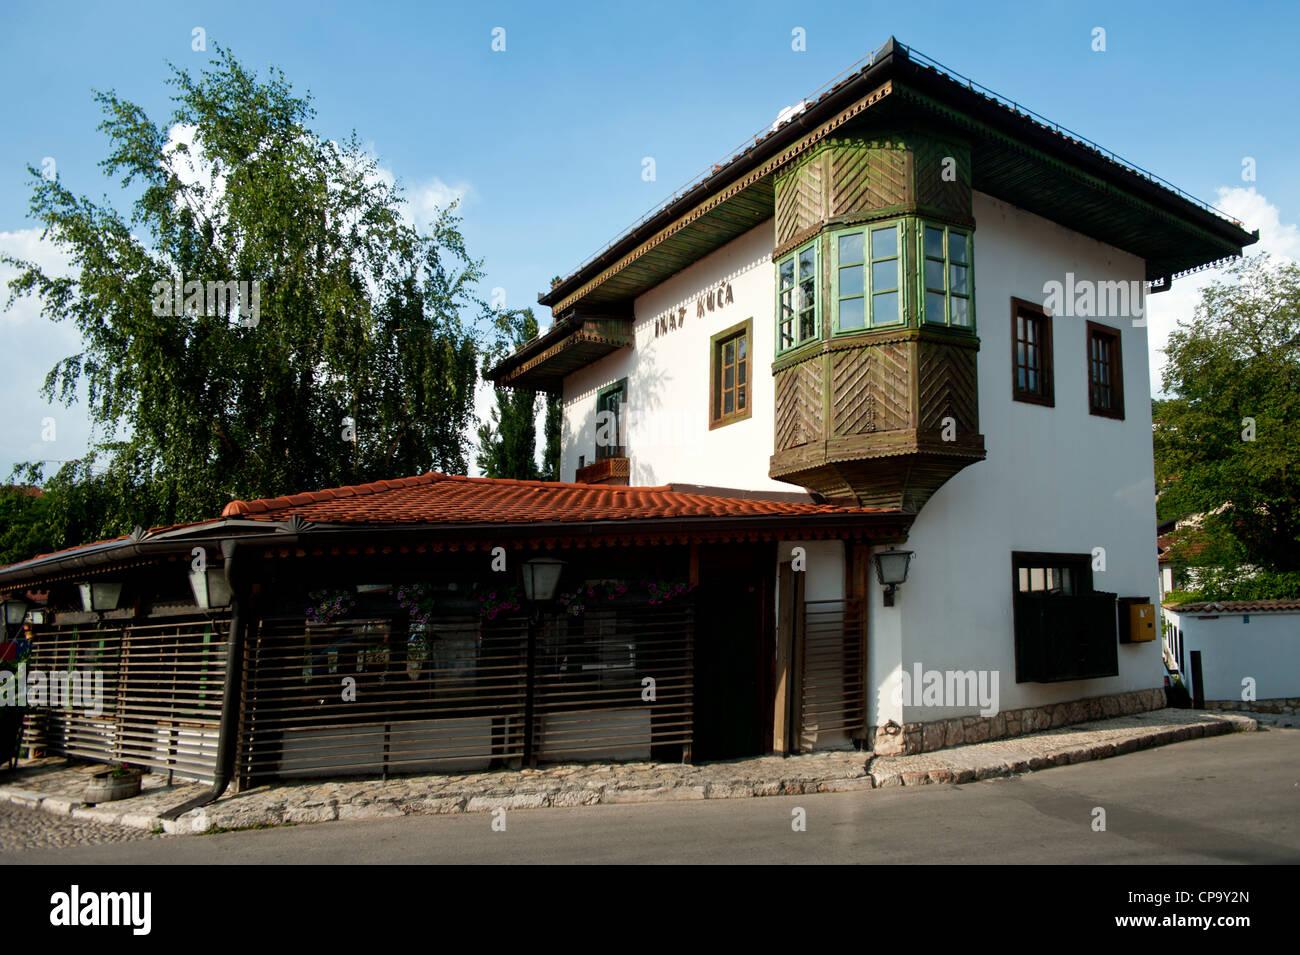 trotz haus im osmanischen wohn stil gebaut sarajevo bosnia herzegowina balkan europa. Black Bedroom Furniture Sets. Home Design Ideas